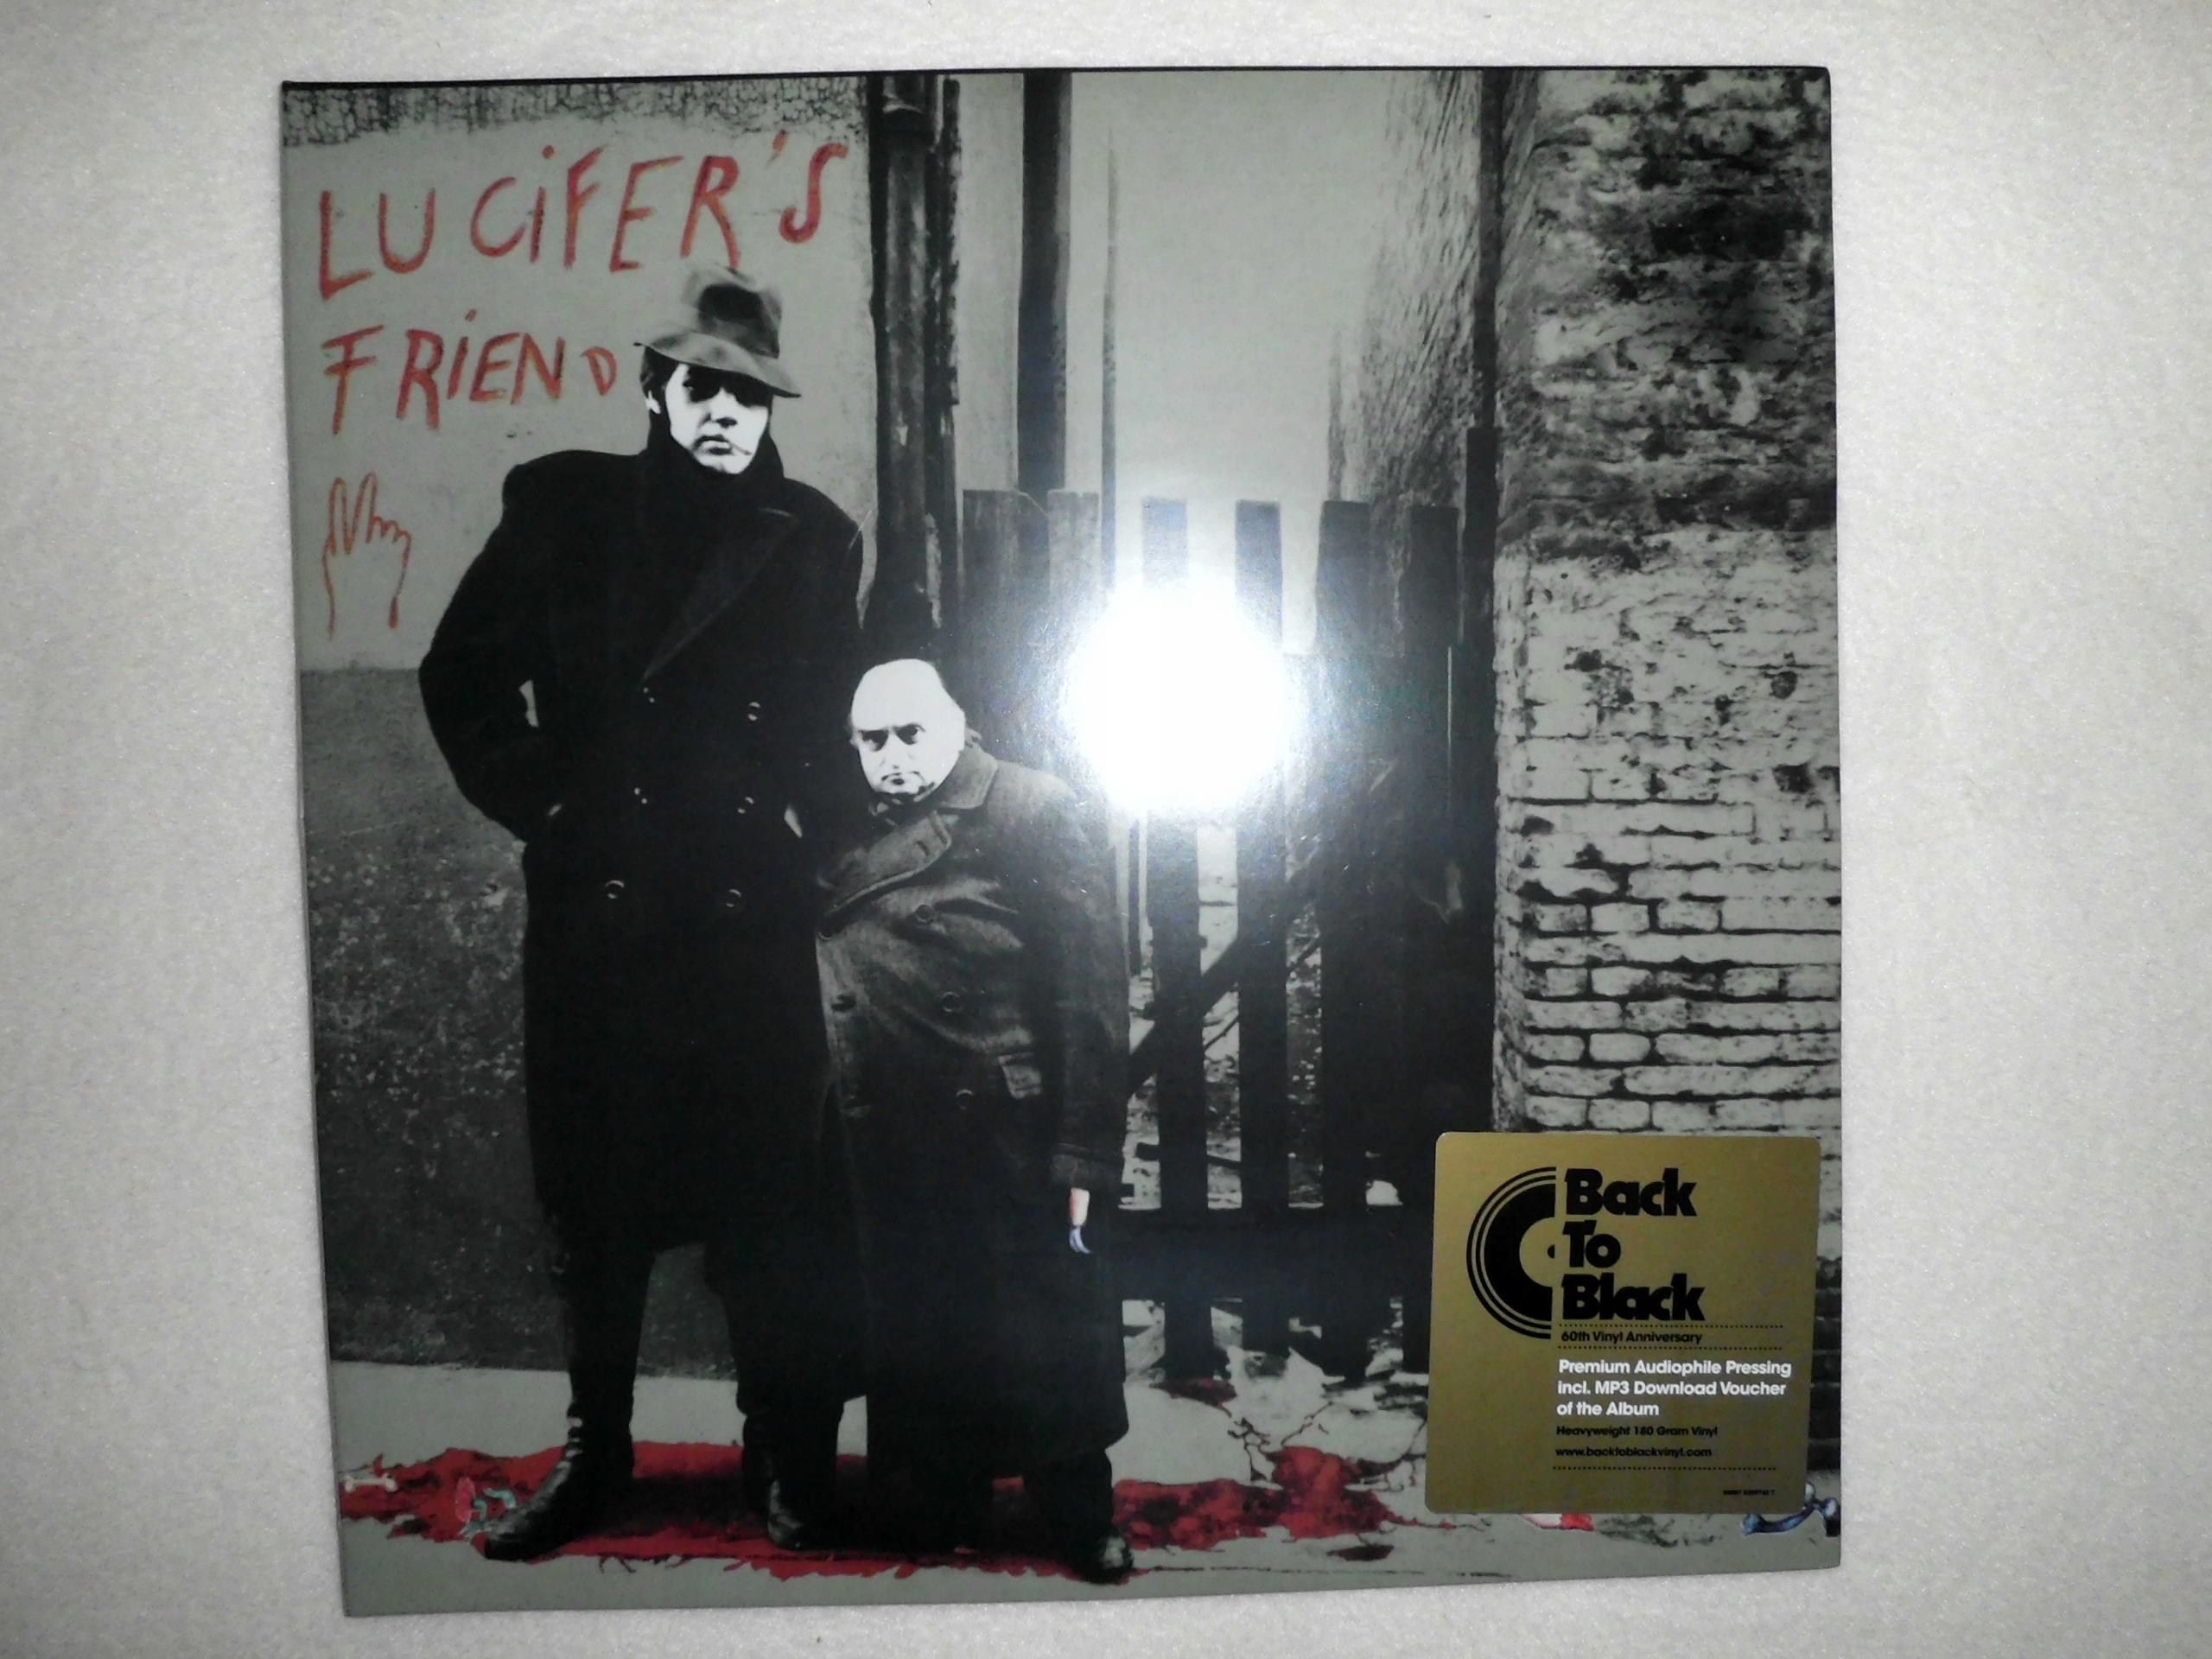 LUCIFER'S FRIEND S/t (1970) LP 180 gr 2010 NOWA